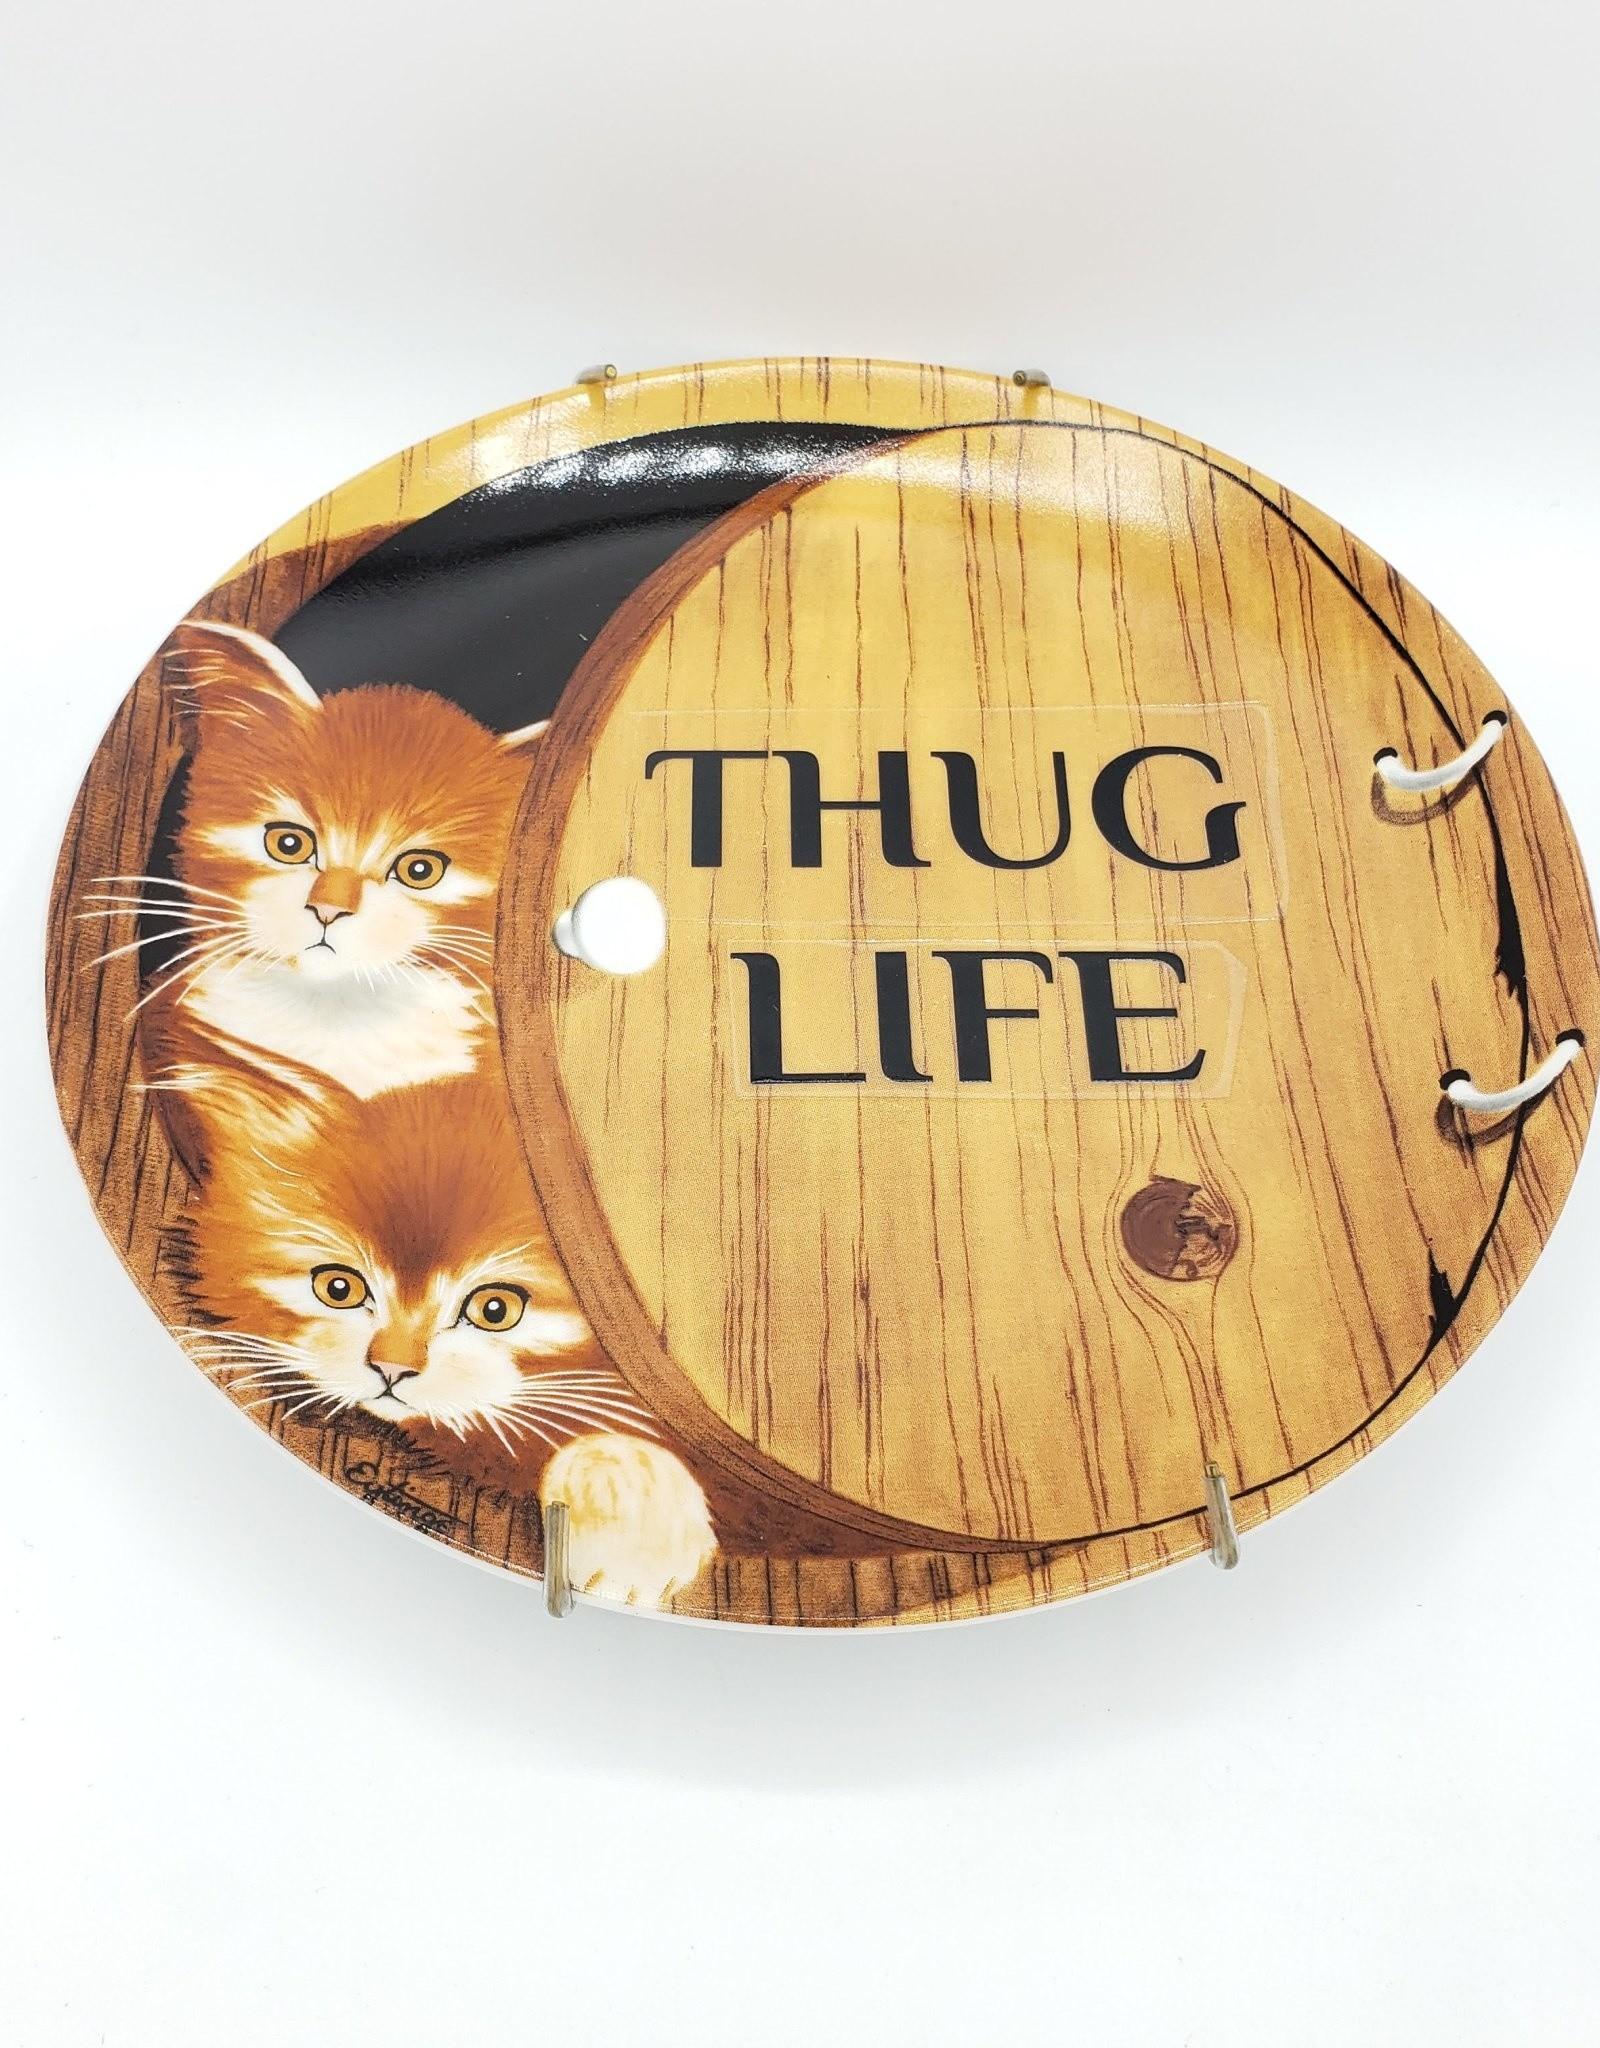 "Redux ""Thug Life"" - Vintage Upcycled Plate Art"